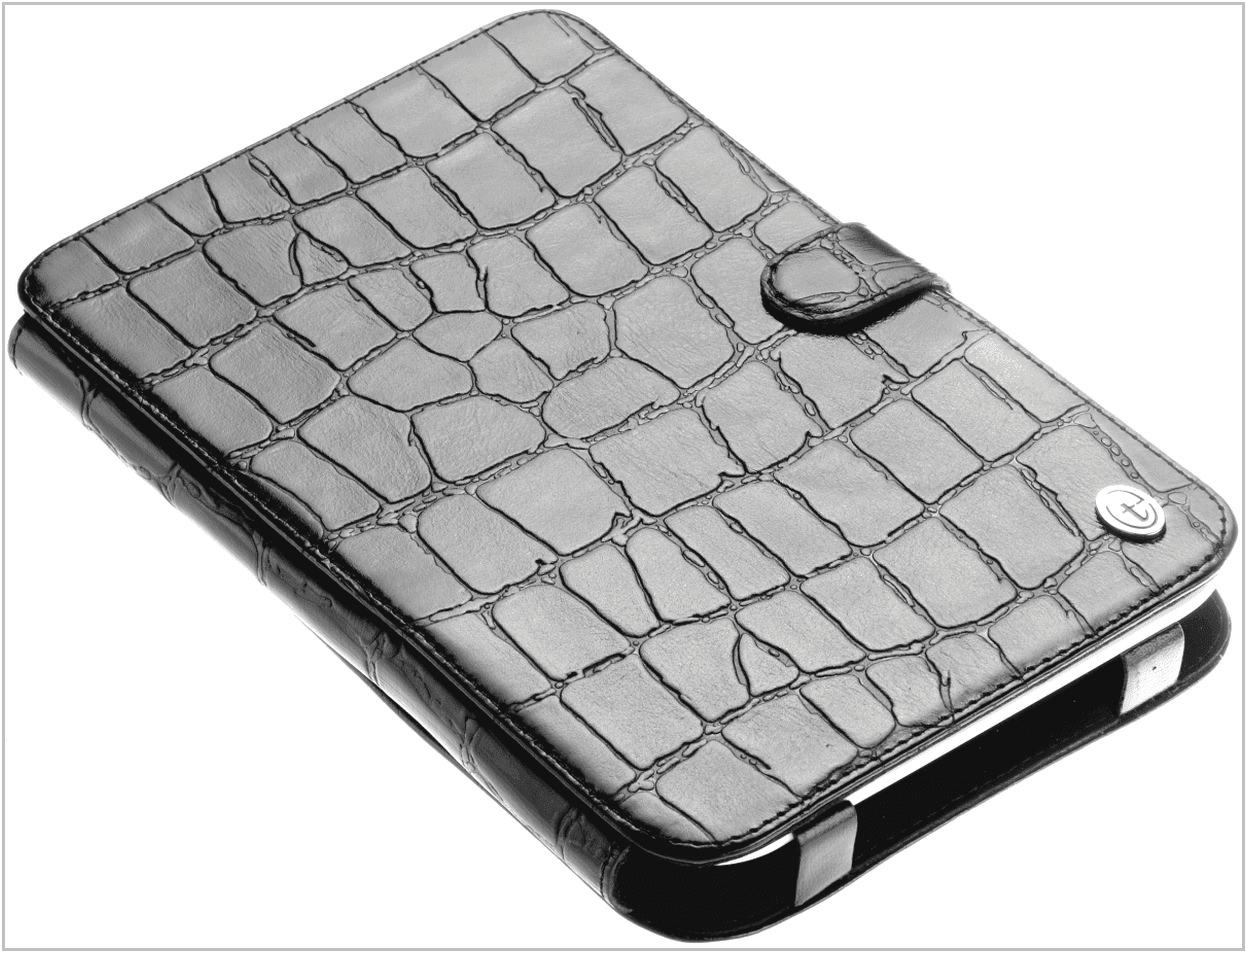 Чехол-обложка для Sony PRS-T2 Time размер с крокодил